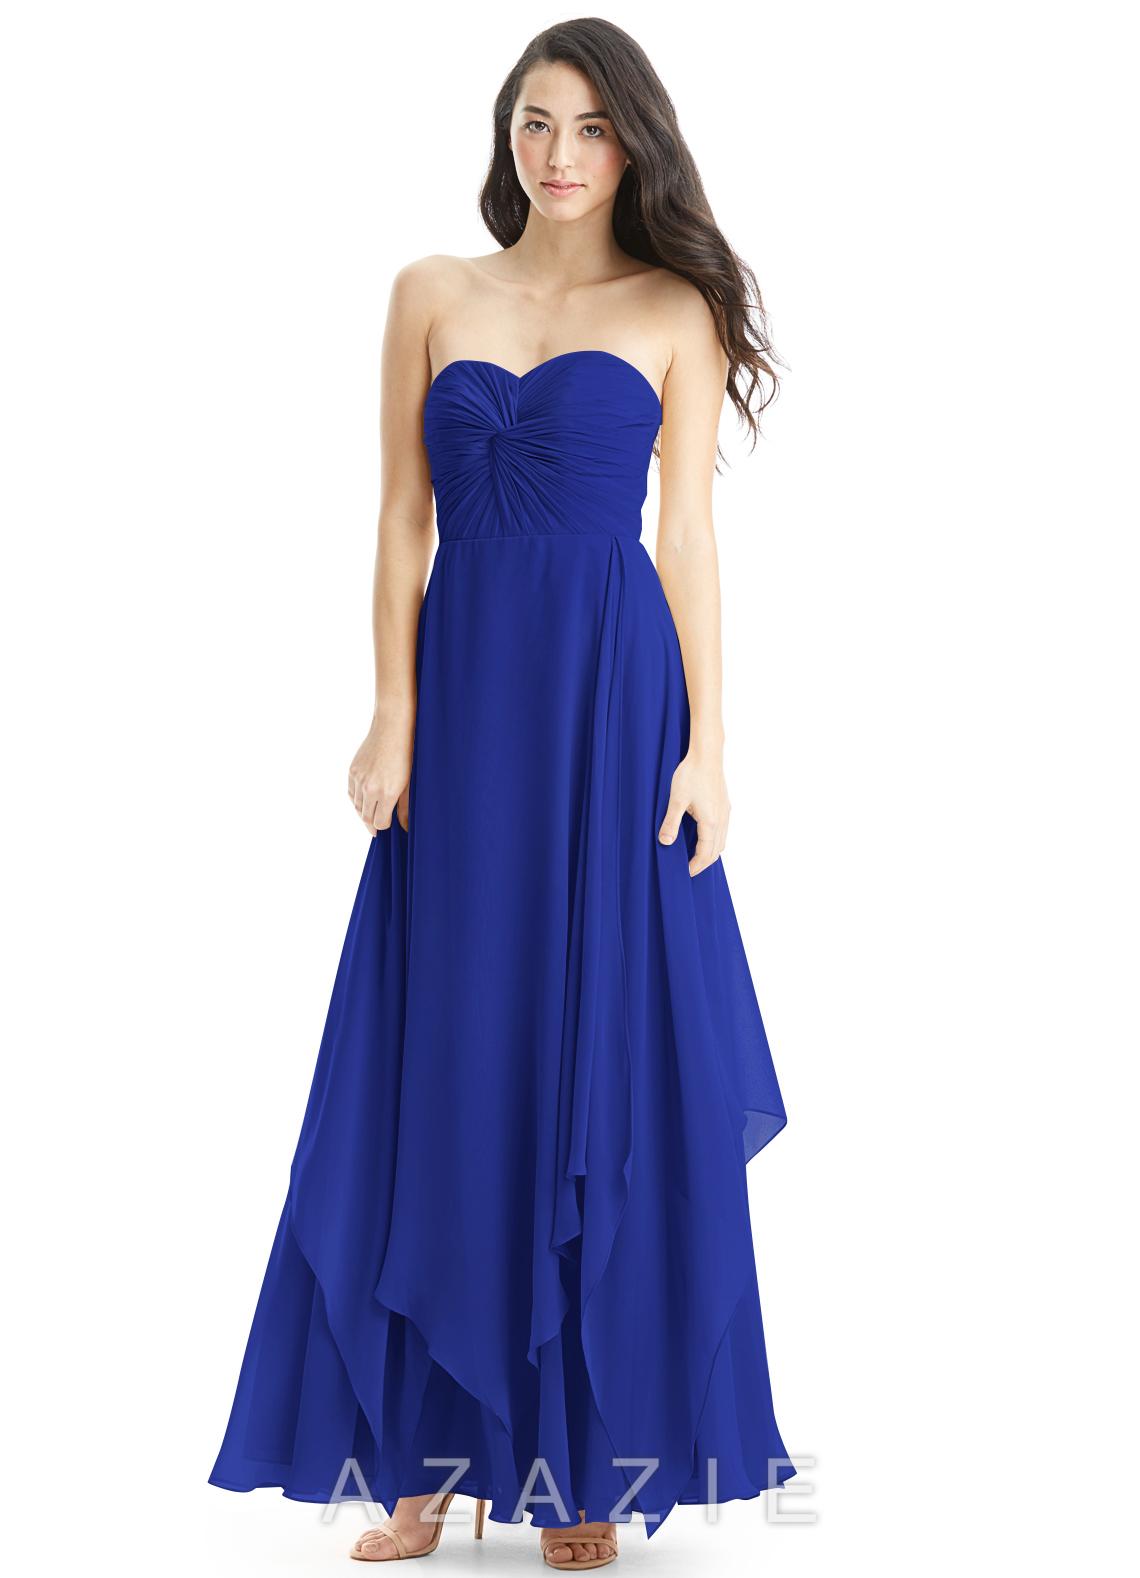 b3a23444b7 Azazie Ginette Bridesmaid Dress